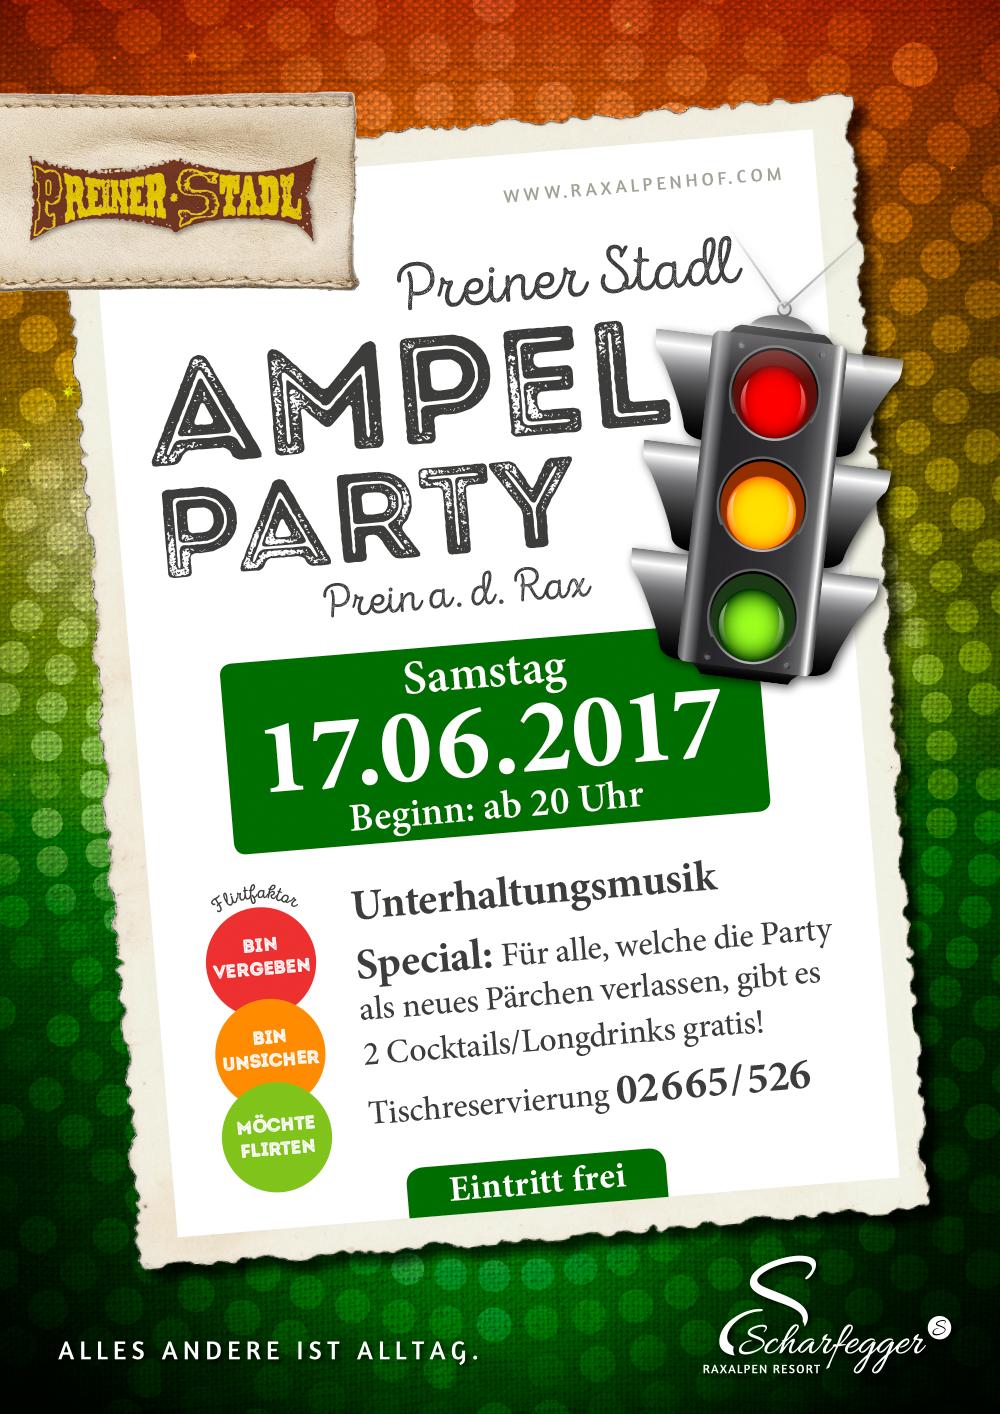 1. Preiner Stadl Ampelparty - Raxalpenhof